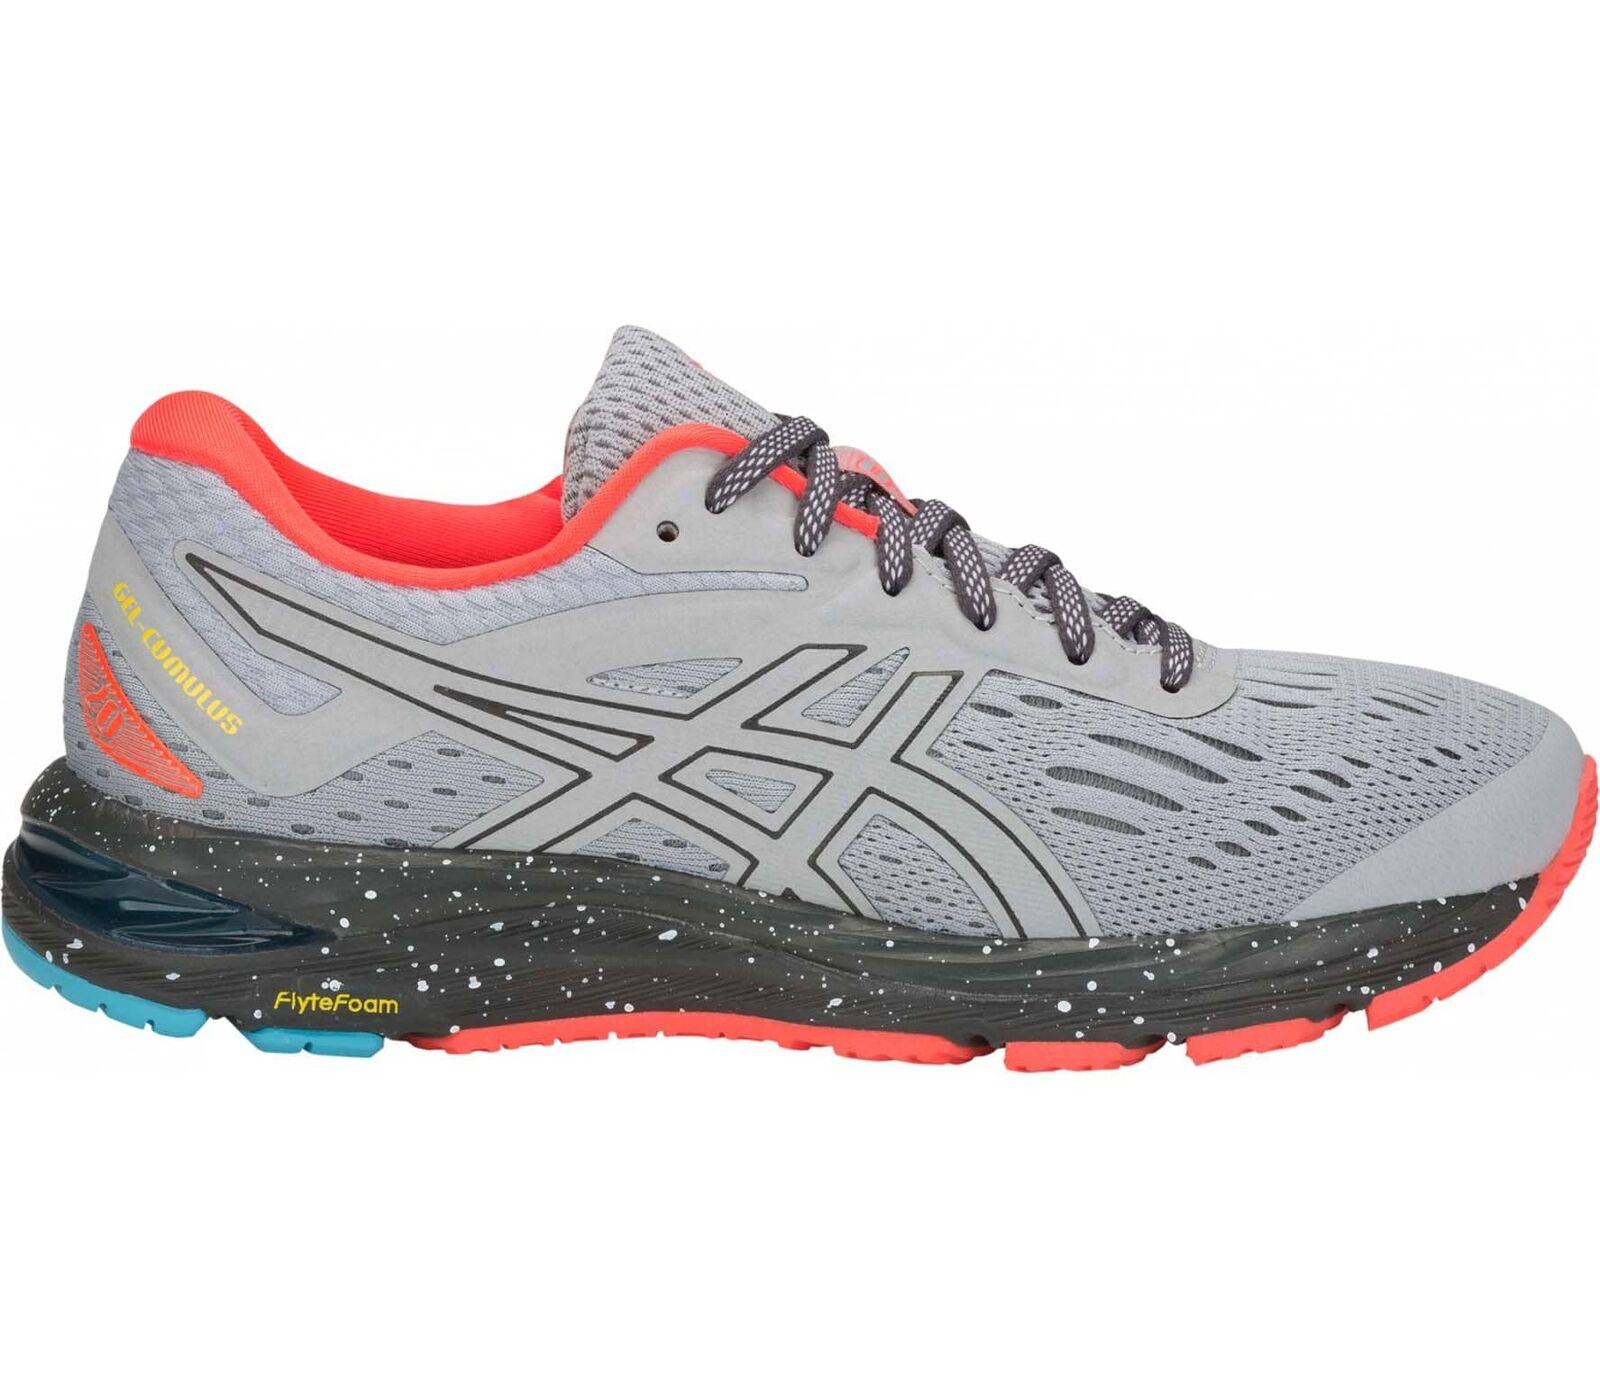 Asics Gel Cumulus 20 LE shoes Running women 1012A218-020